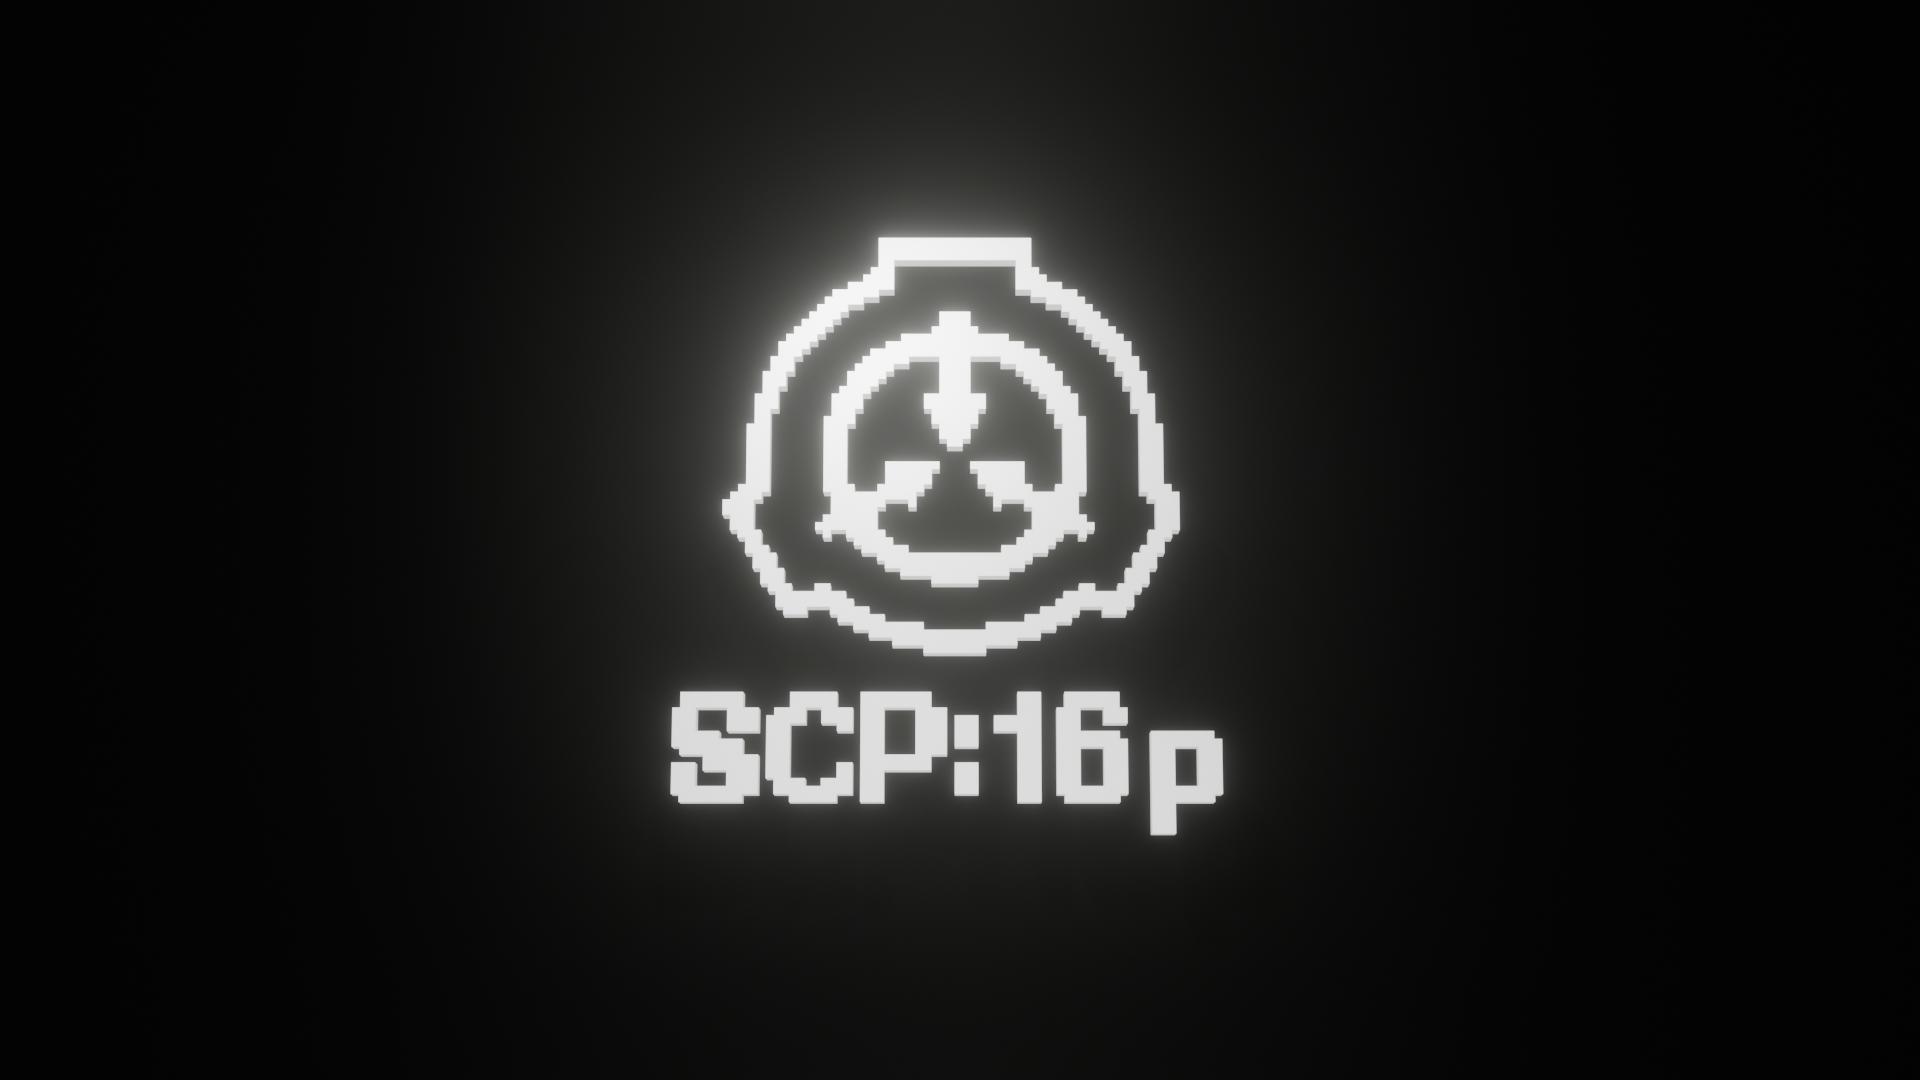 SCP-16p